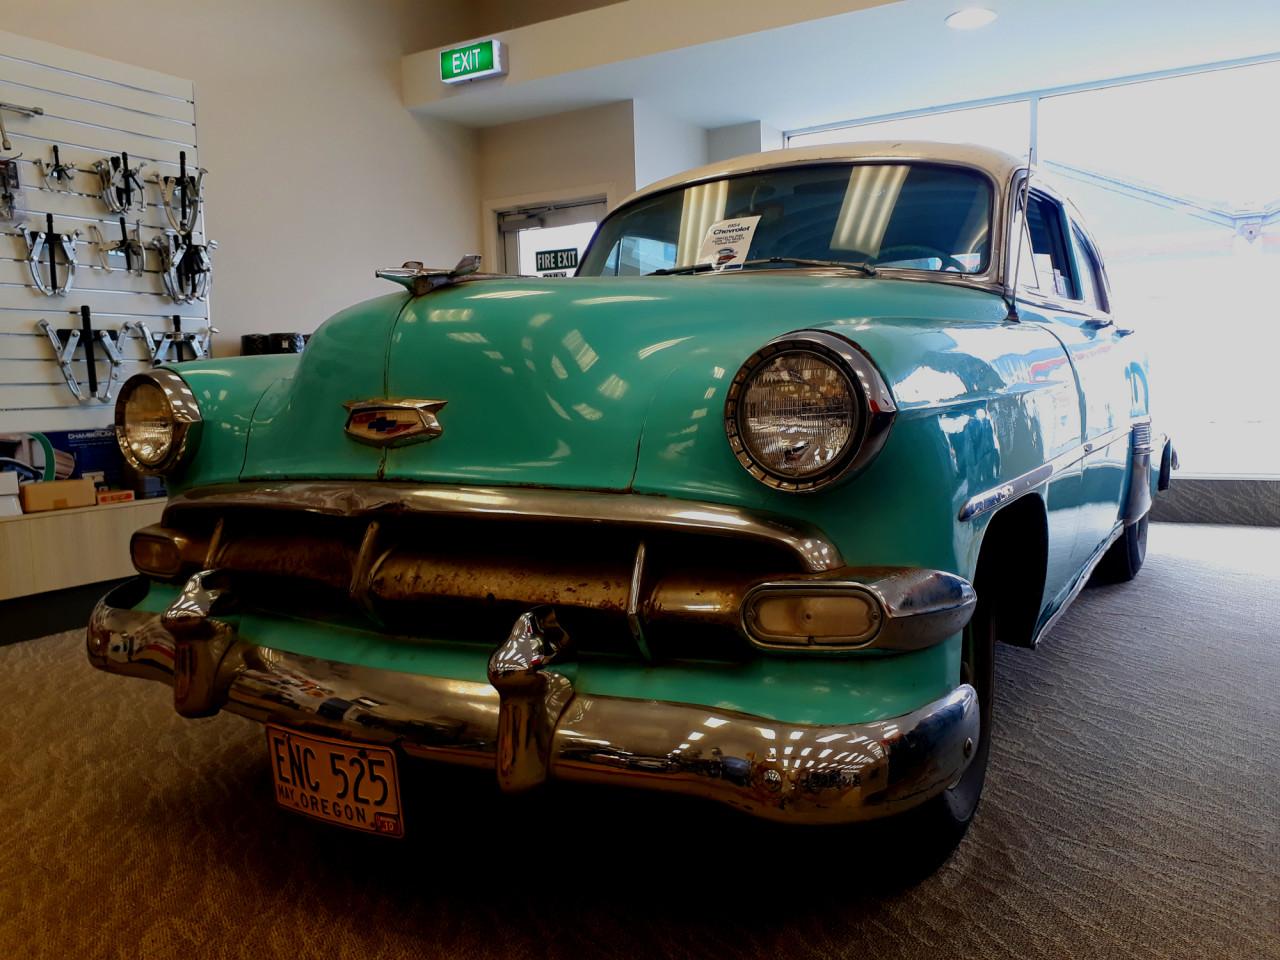 The movie car, a 1954 Chevrolet.